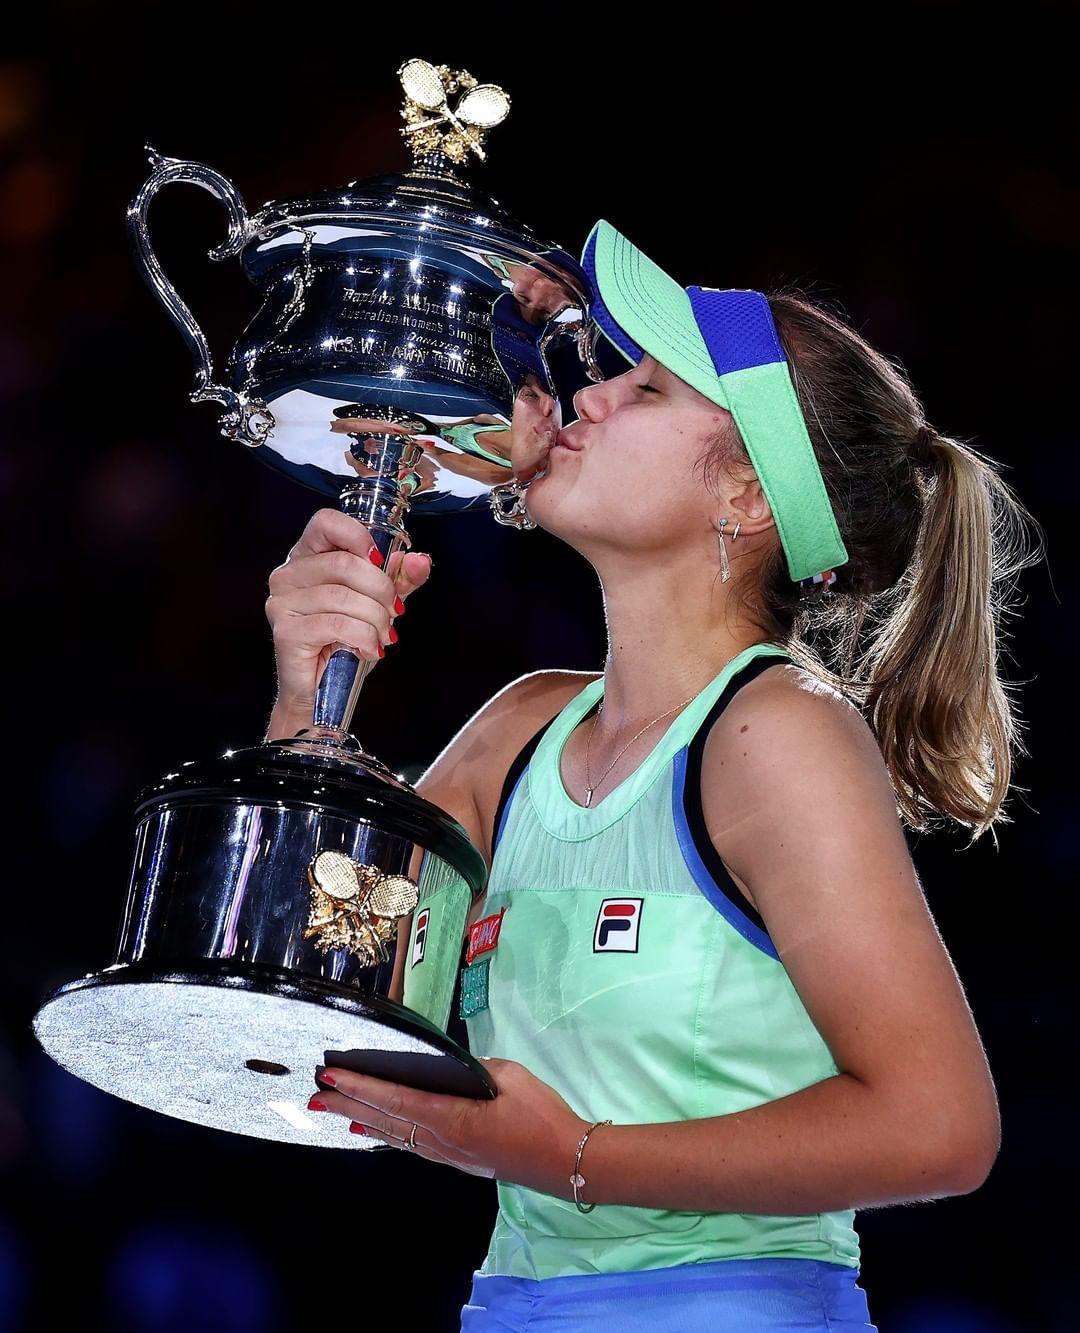 American Sofia Kenin Kisses Her First Grand Slam Trophy After She Beat Garbine Muguruza To Win The Australian Open Meet The Youngest Em 2020